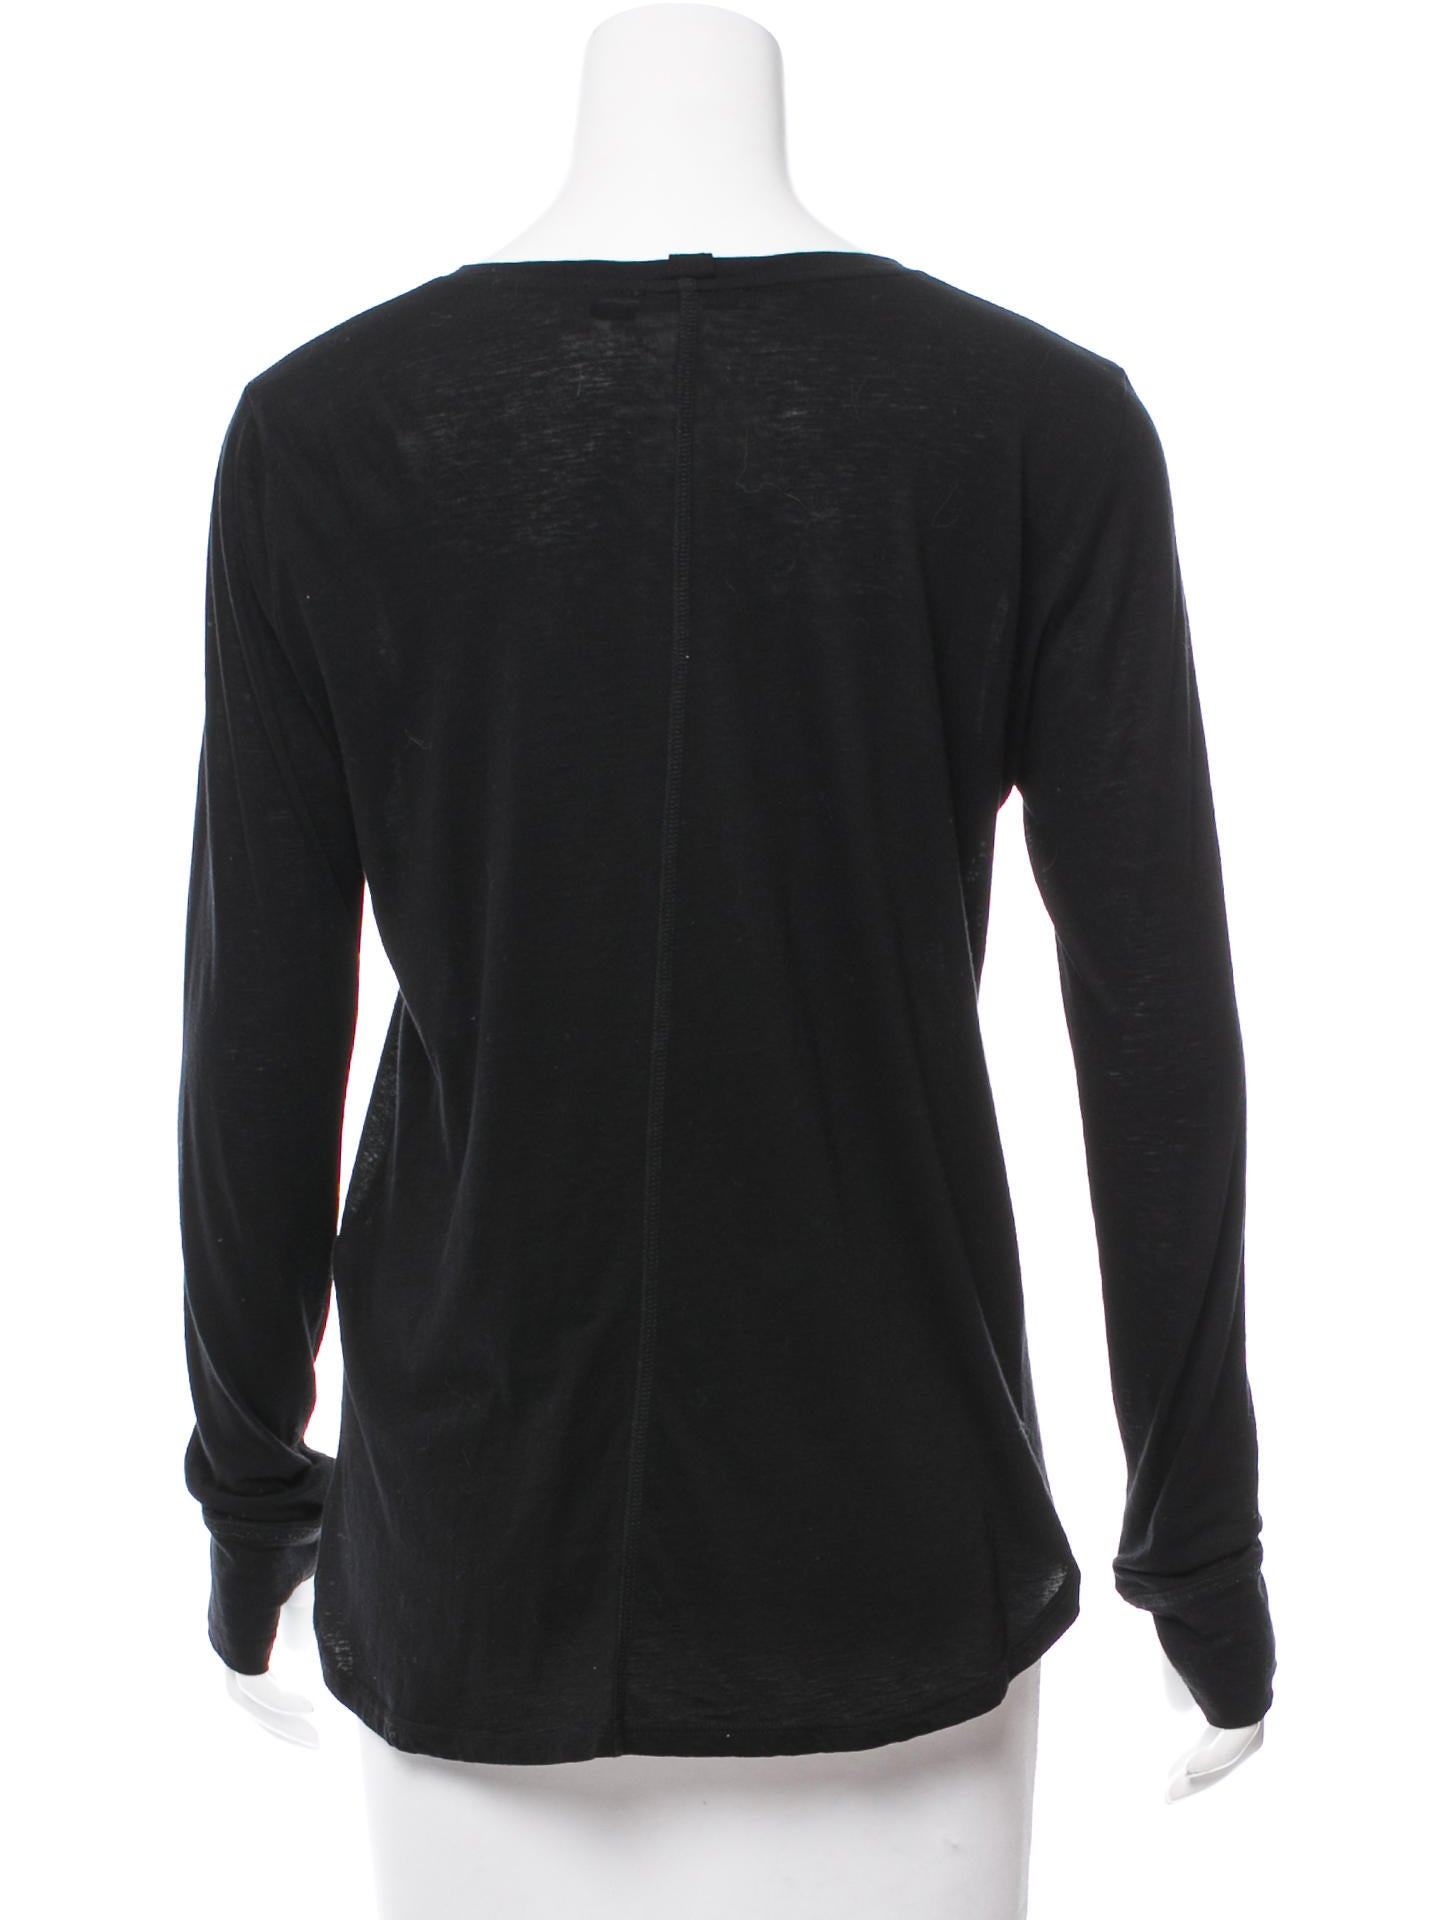 Helmut lang long sleeve t shirt clothing whelm51747 for Helmut lang t shirt